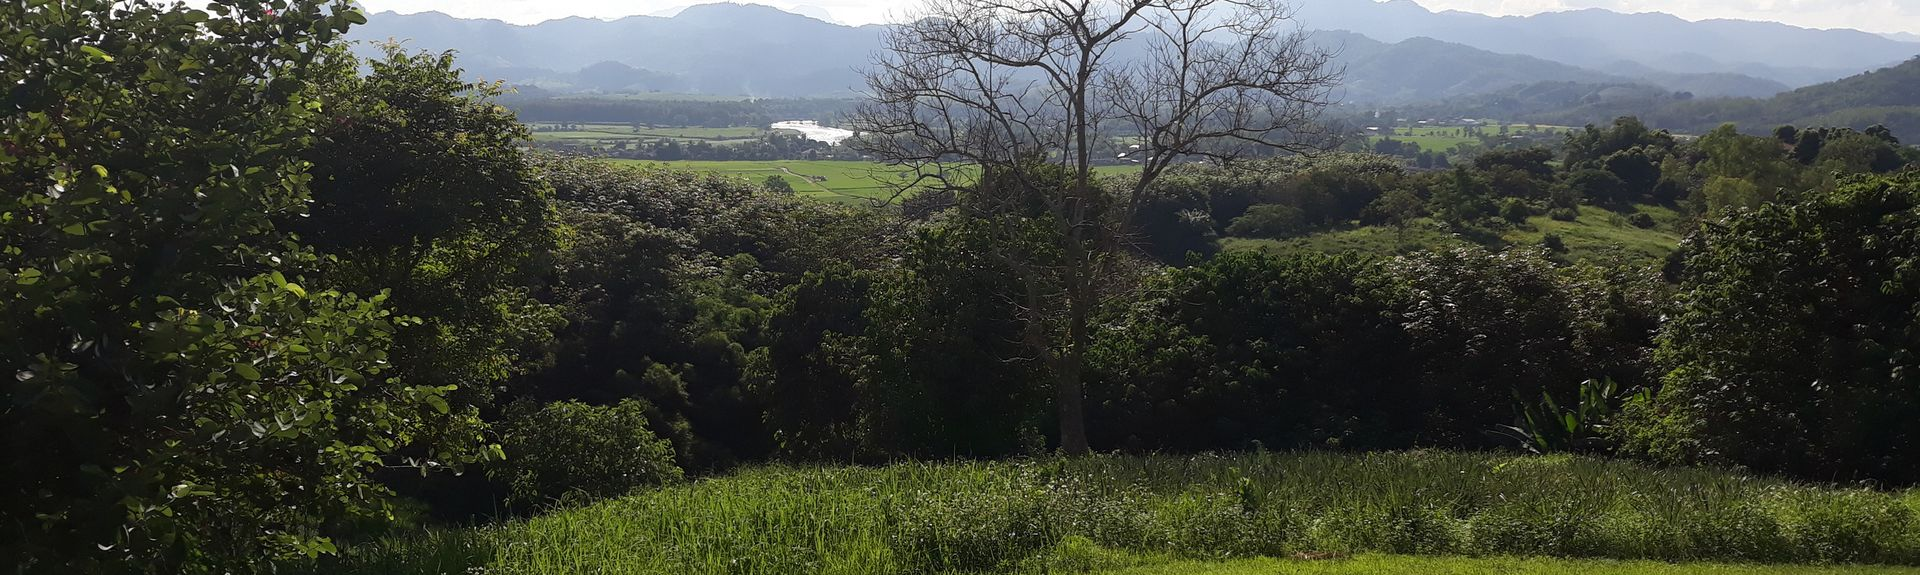 Chiang Rai, Provinsen Chiang Rai, Thailand